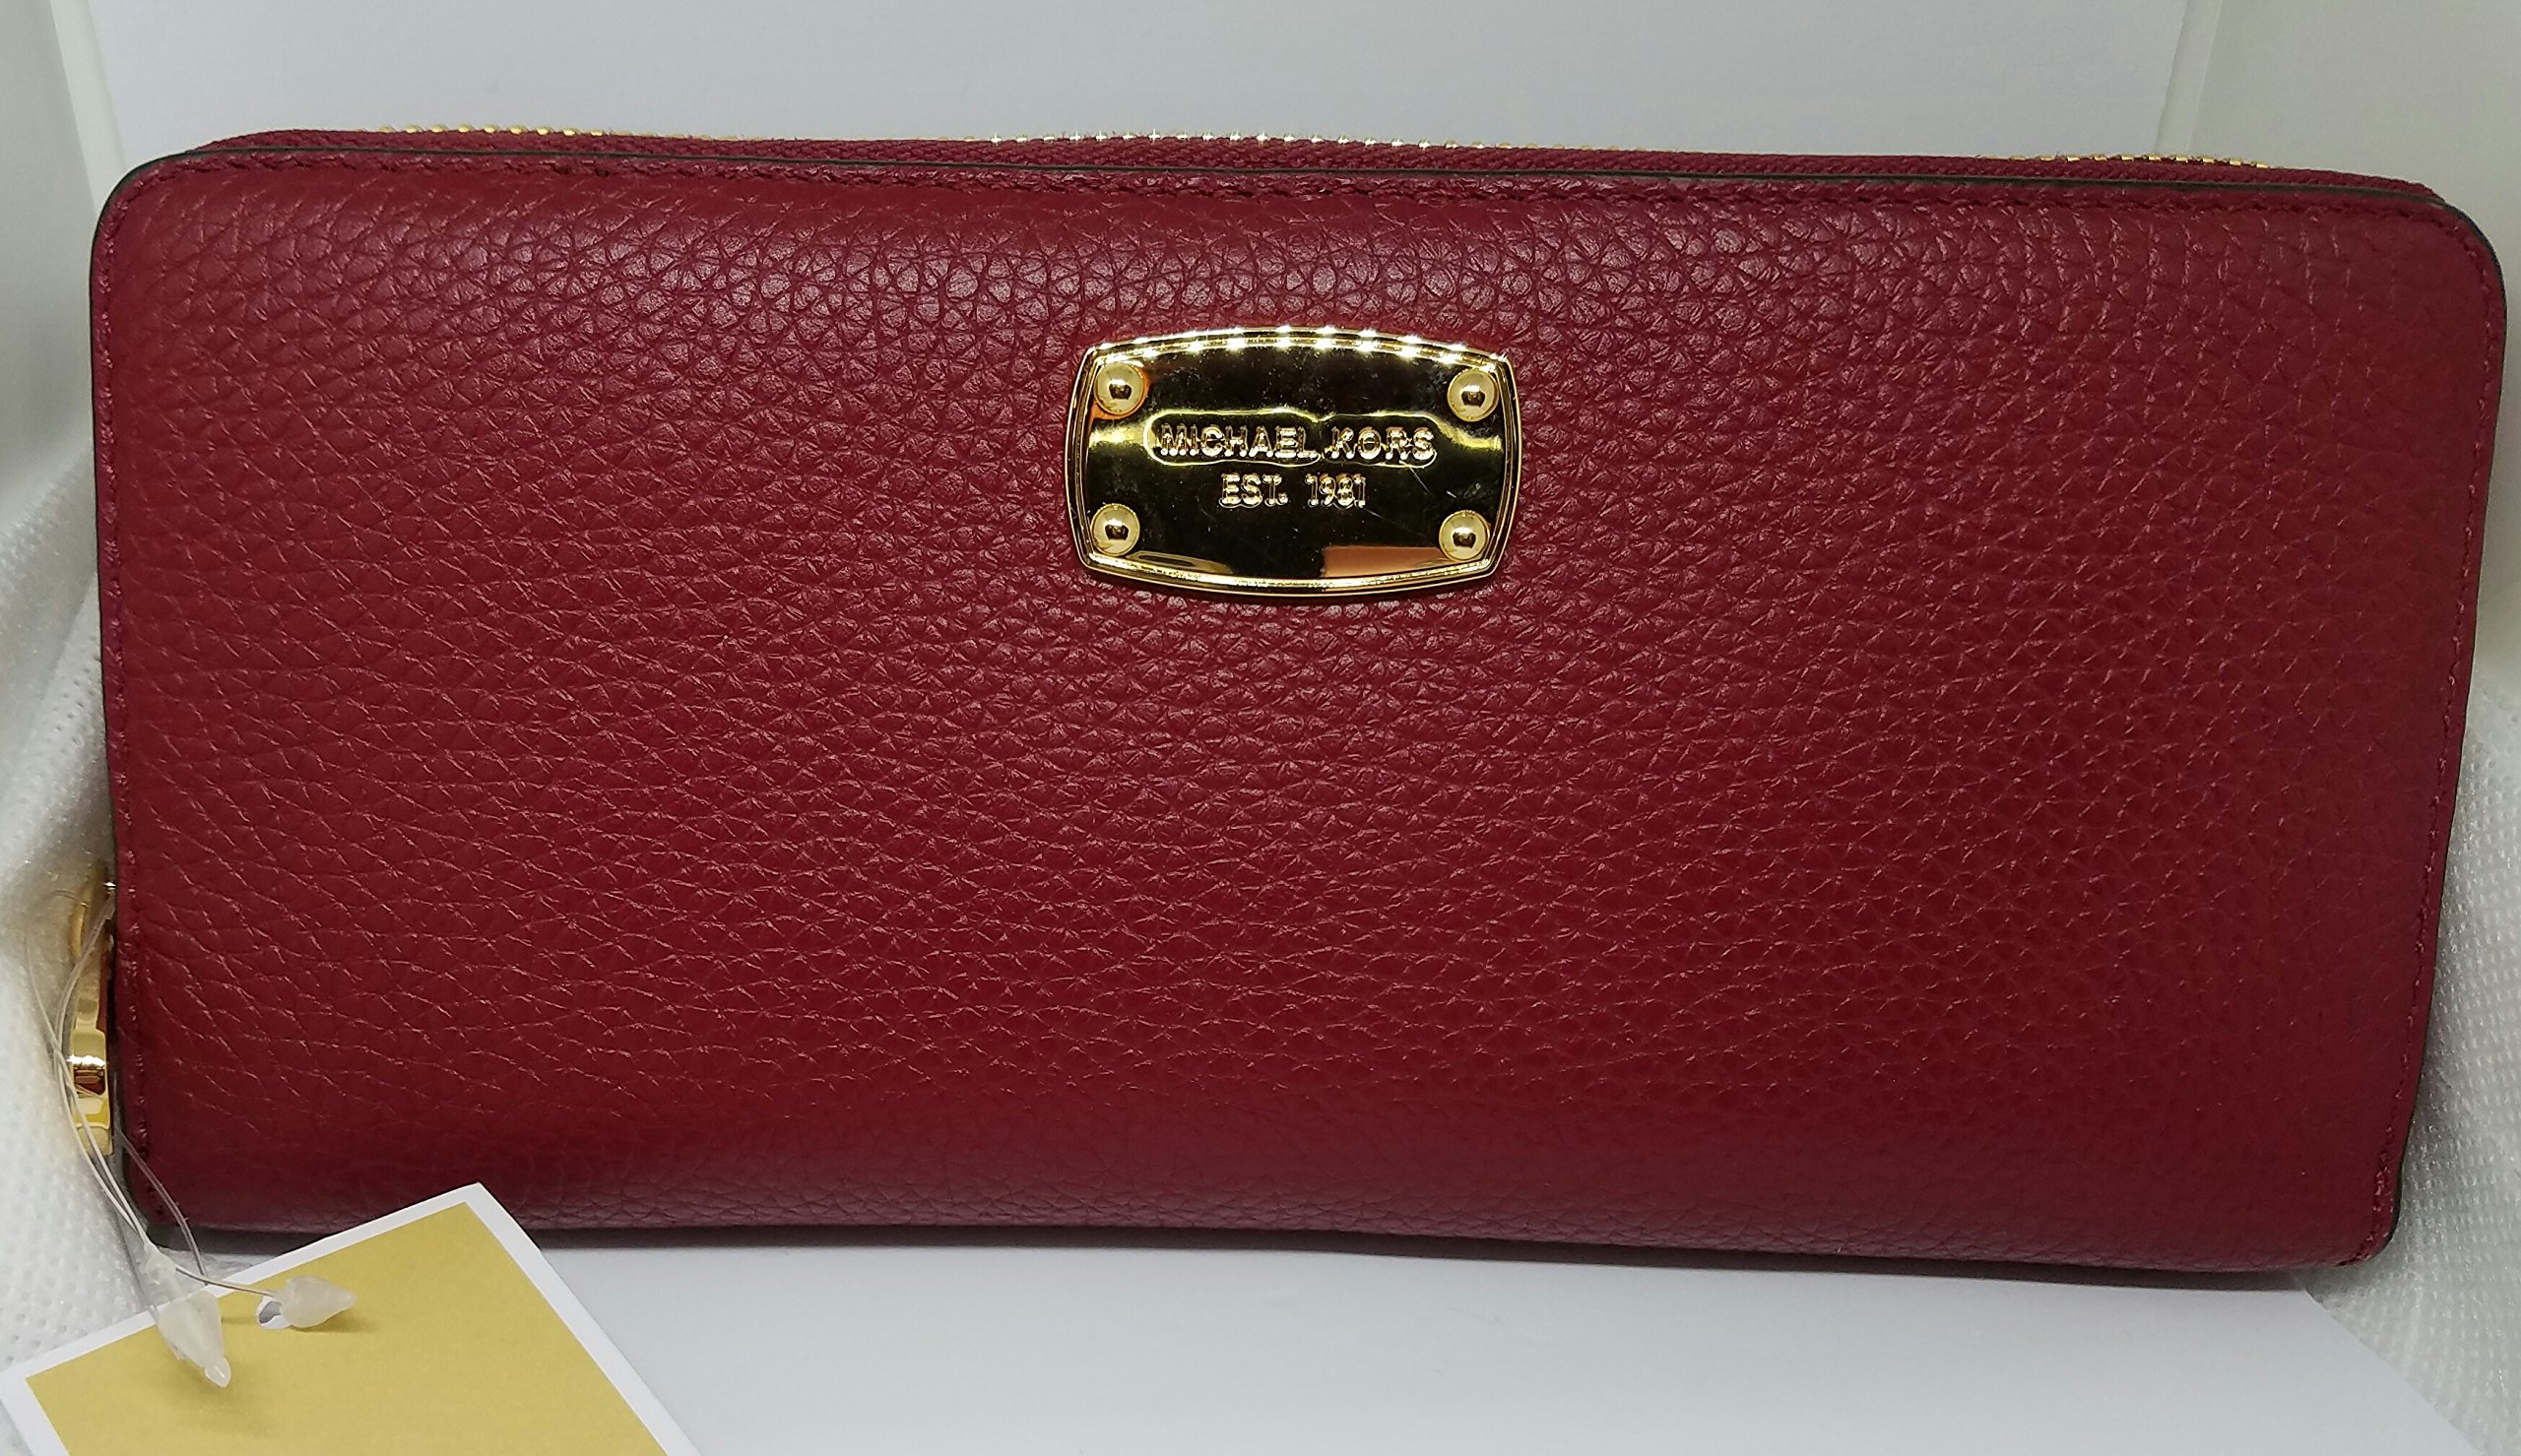 Michael Kors Jet Set Travel Zip Around Pebbled Leather Wallet, Cherry by Michael Kors